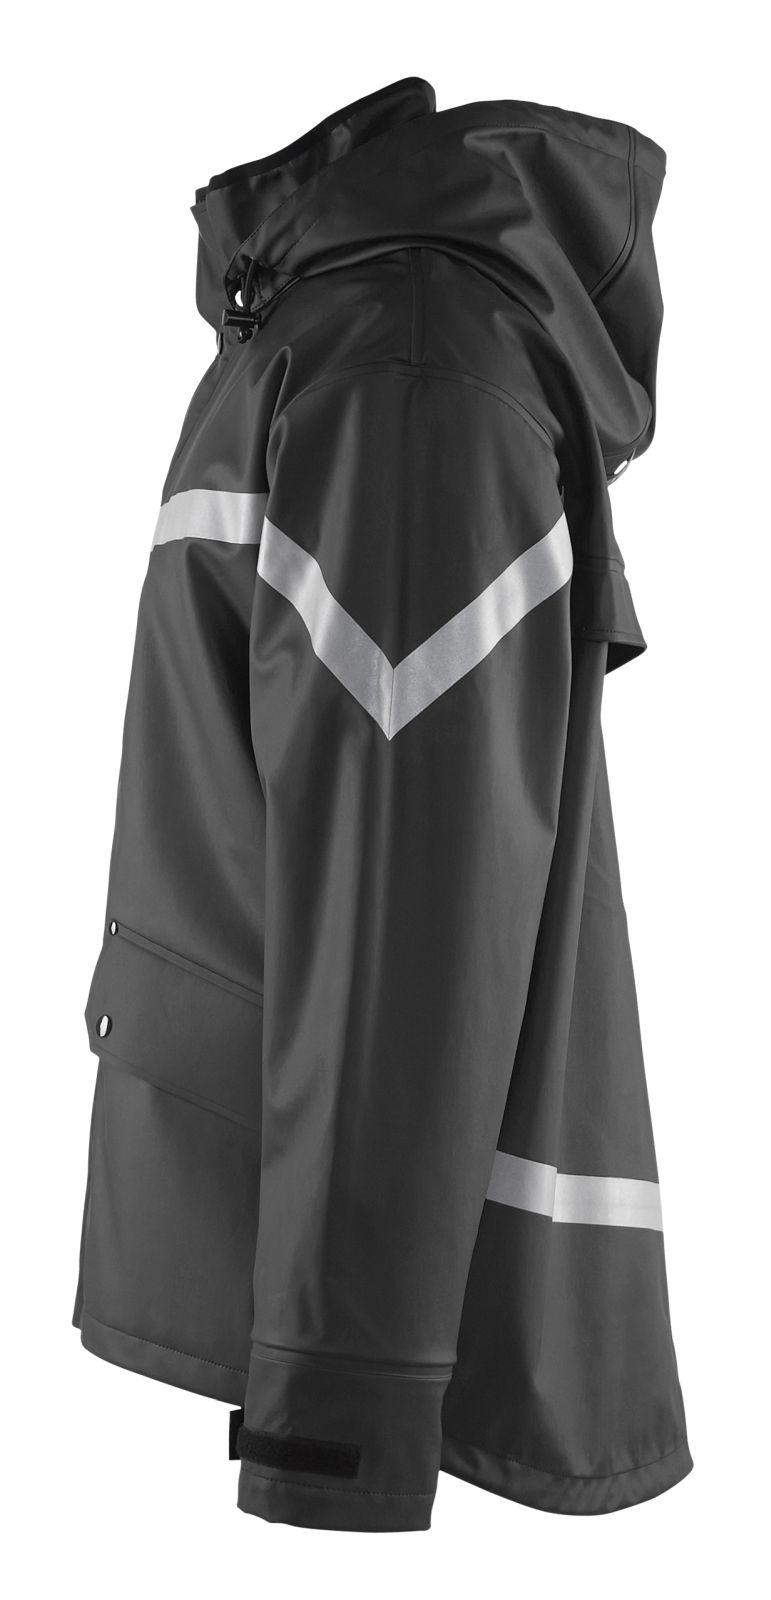 Blaklader Regenjacks 43052003 zwart(9900)